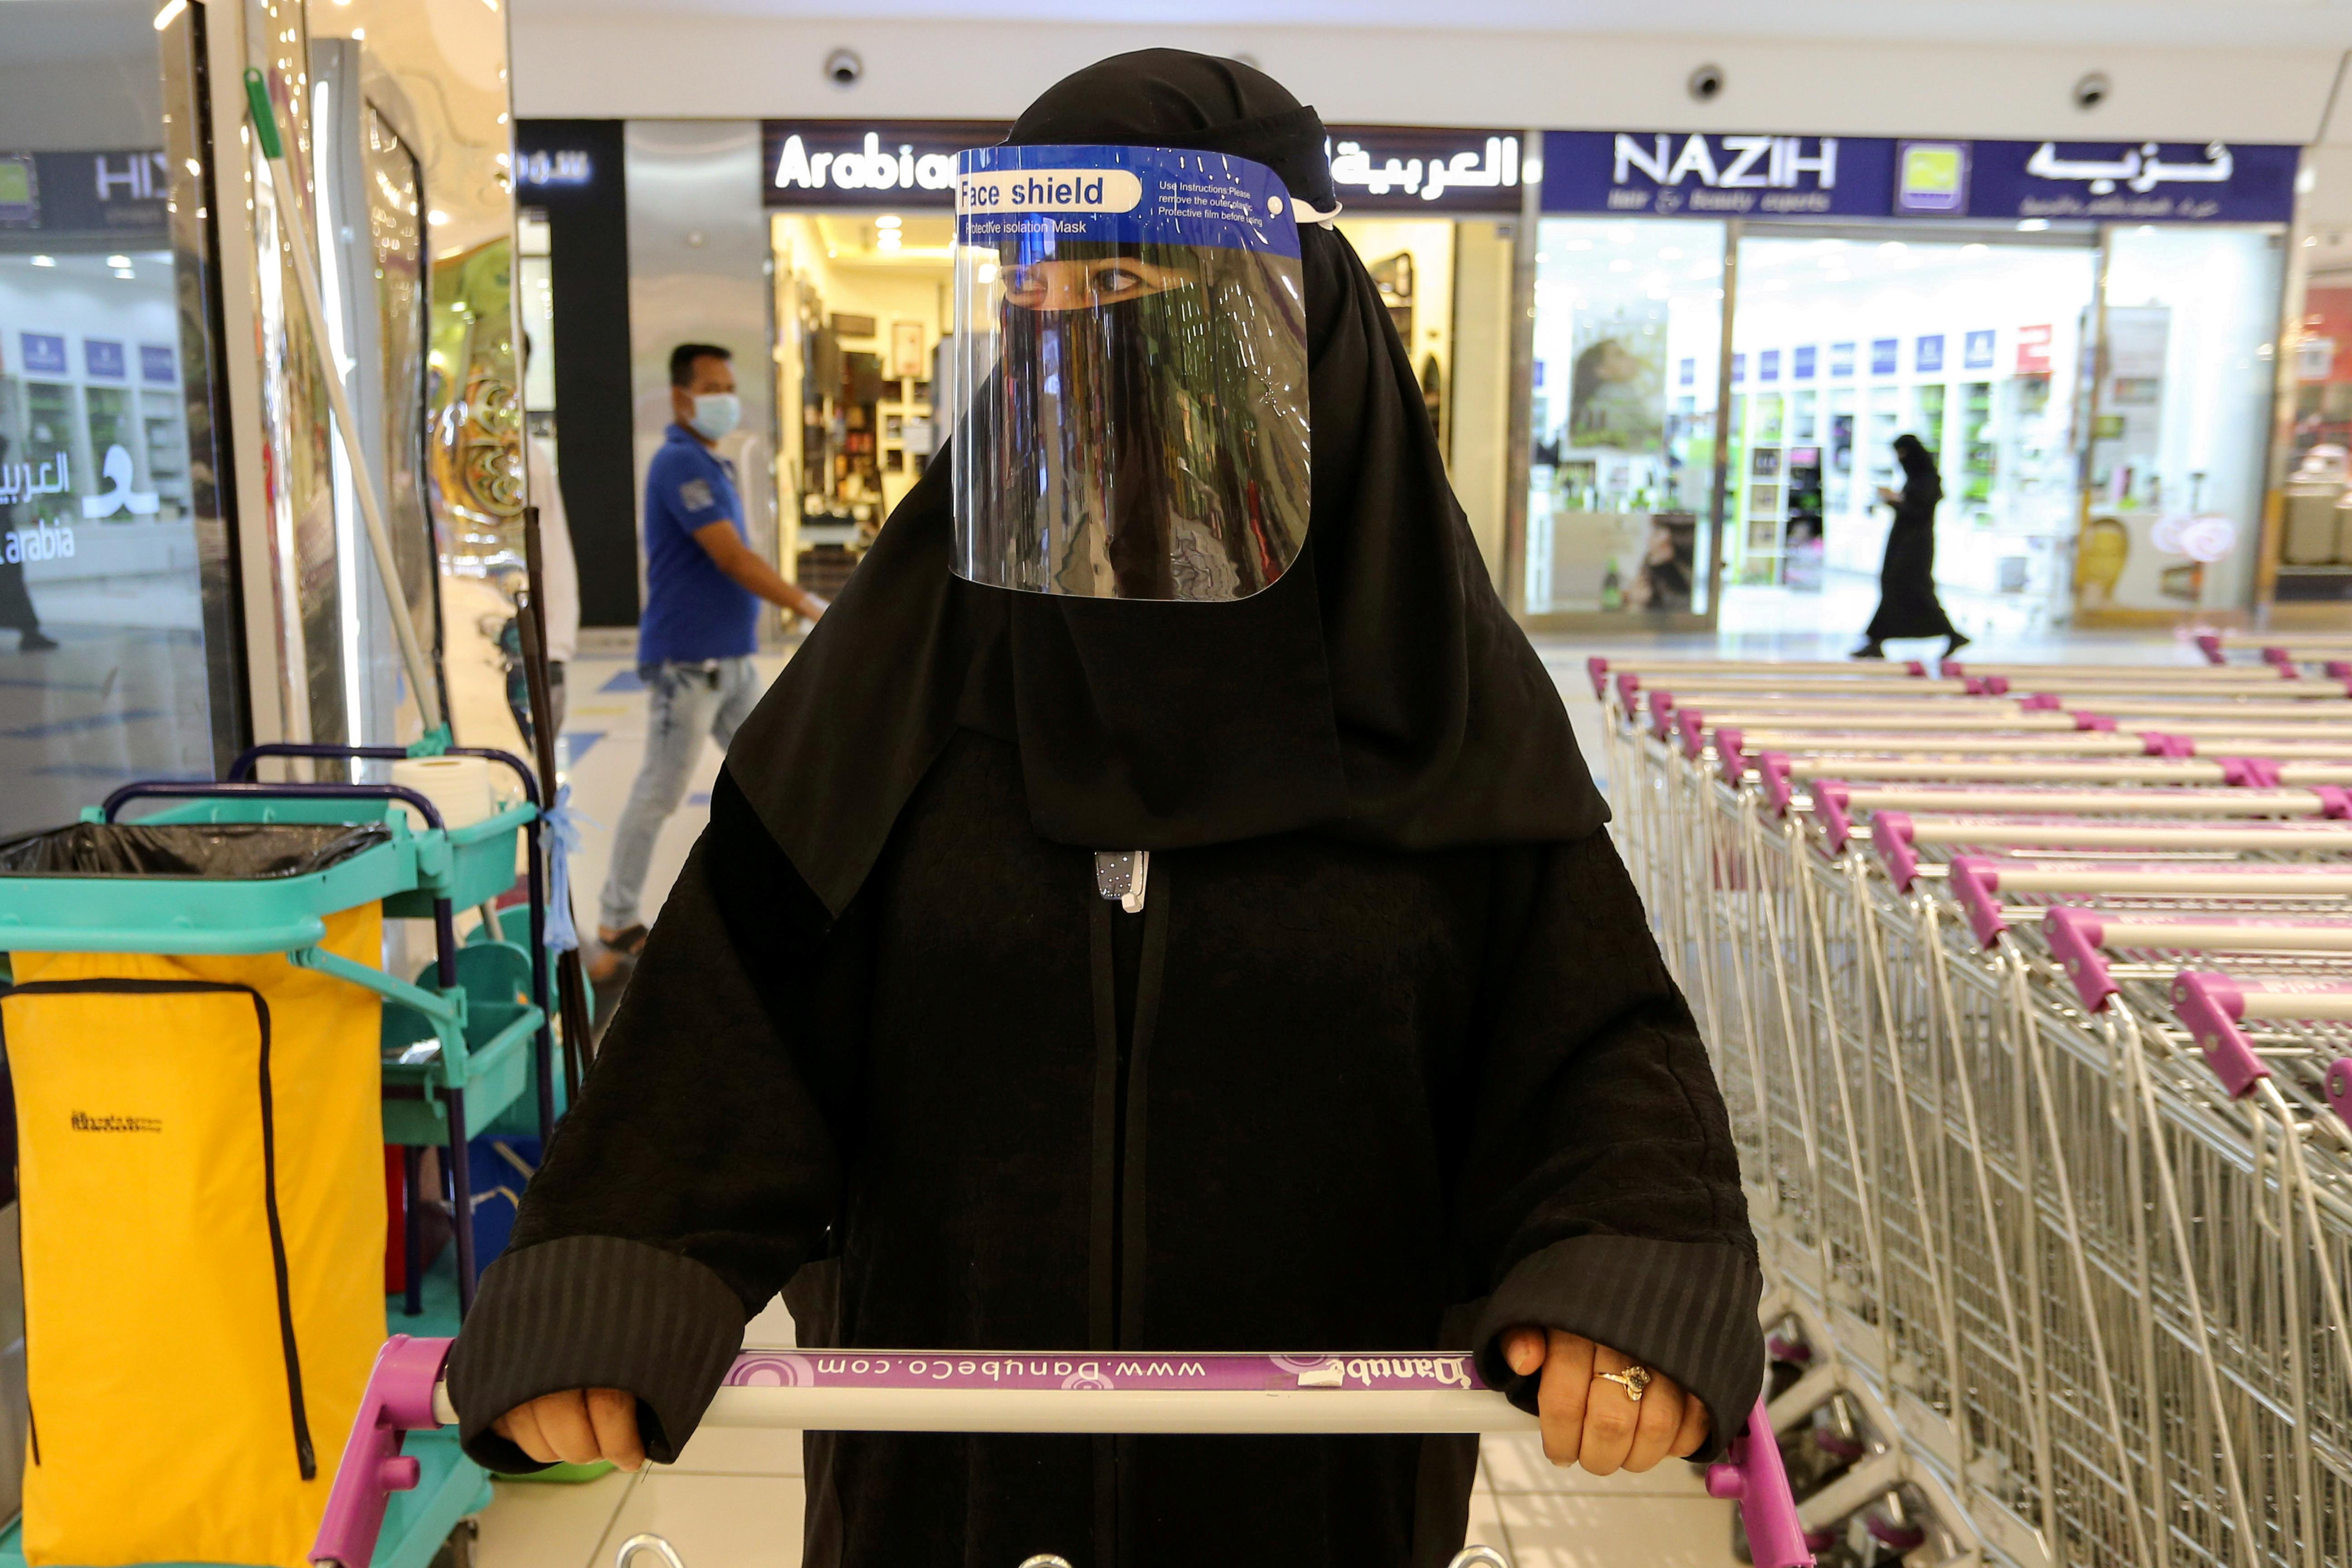 A Saudi woman, wearing a face shield, shops at a supermarket, following the outbreak of the coronavirus disease (COVID-19) in Riyadh, Saudi Arabia June 14, 2020. REUTERS/Ahmed Yosri